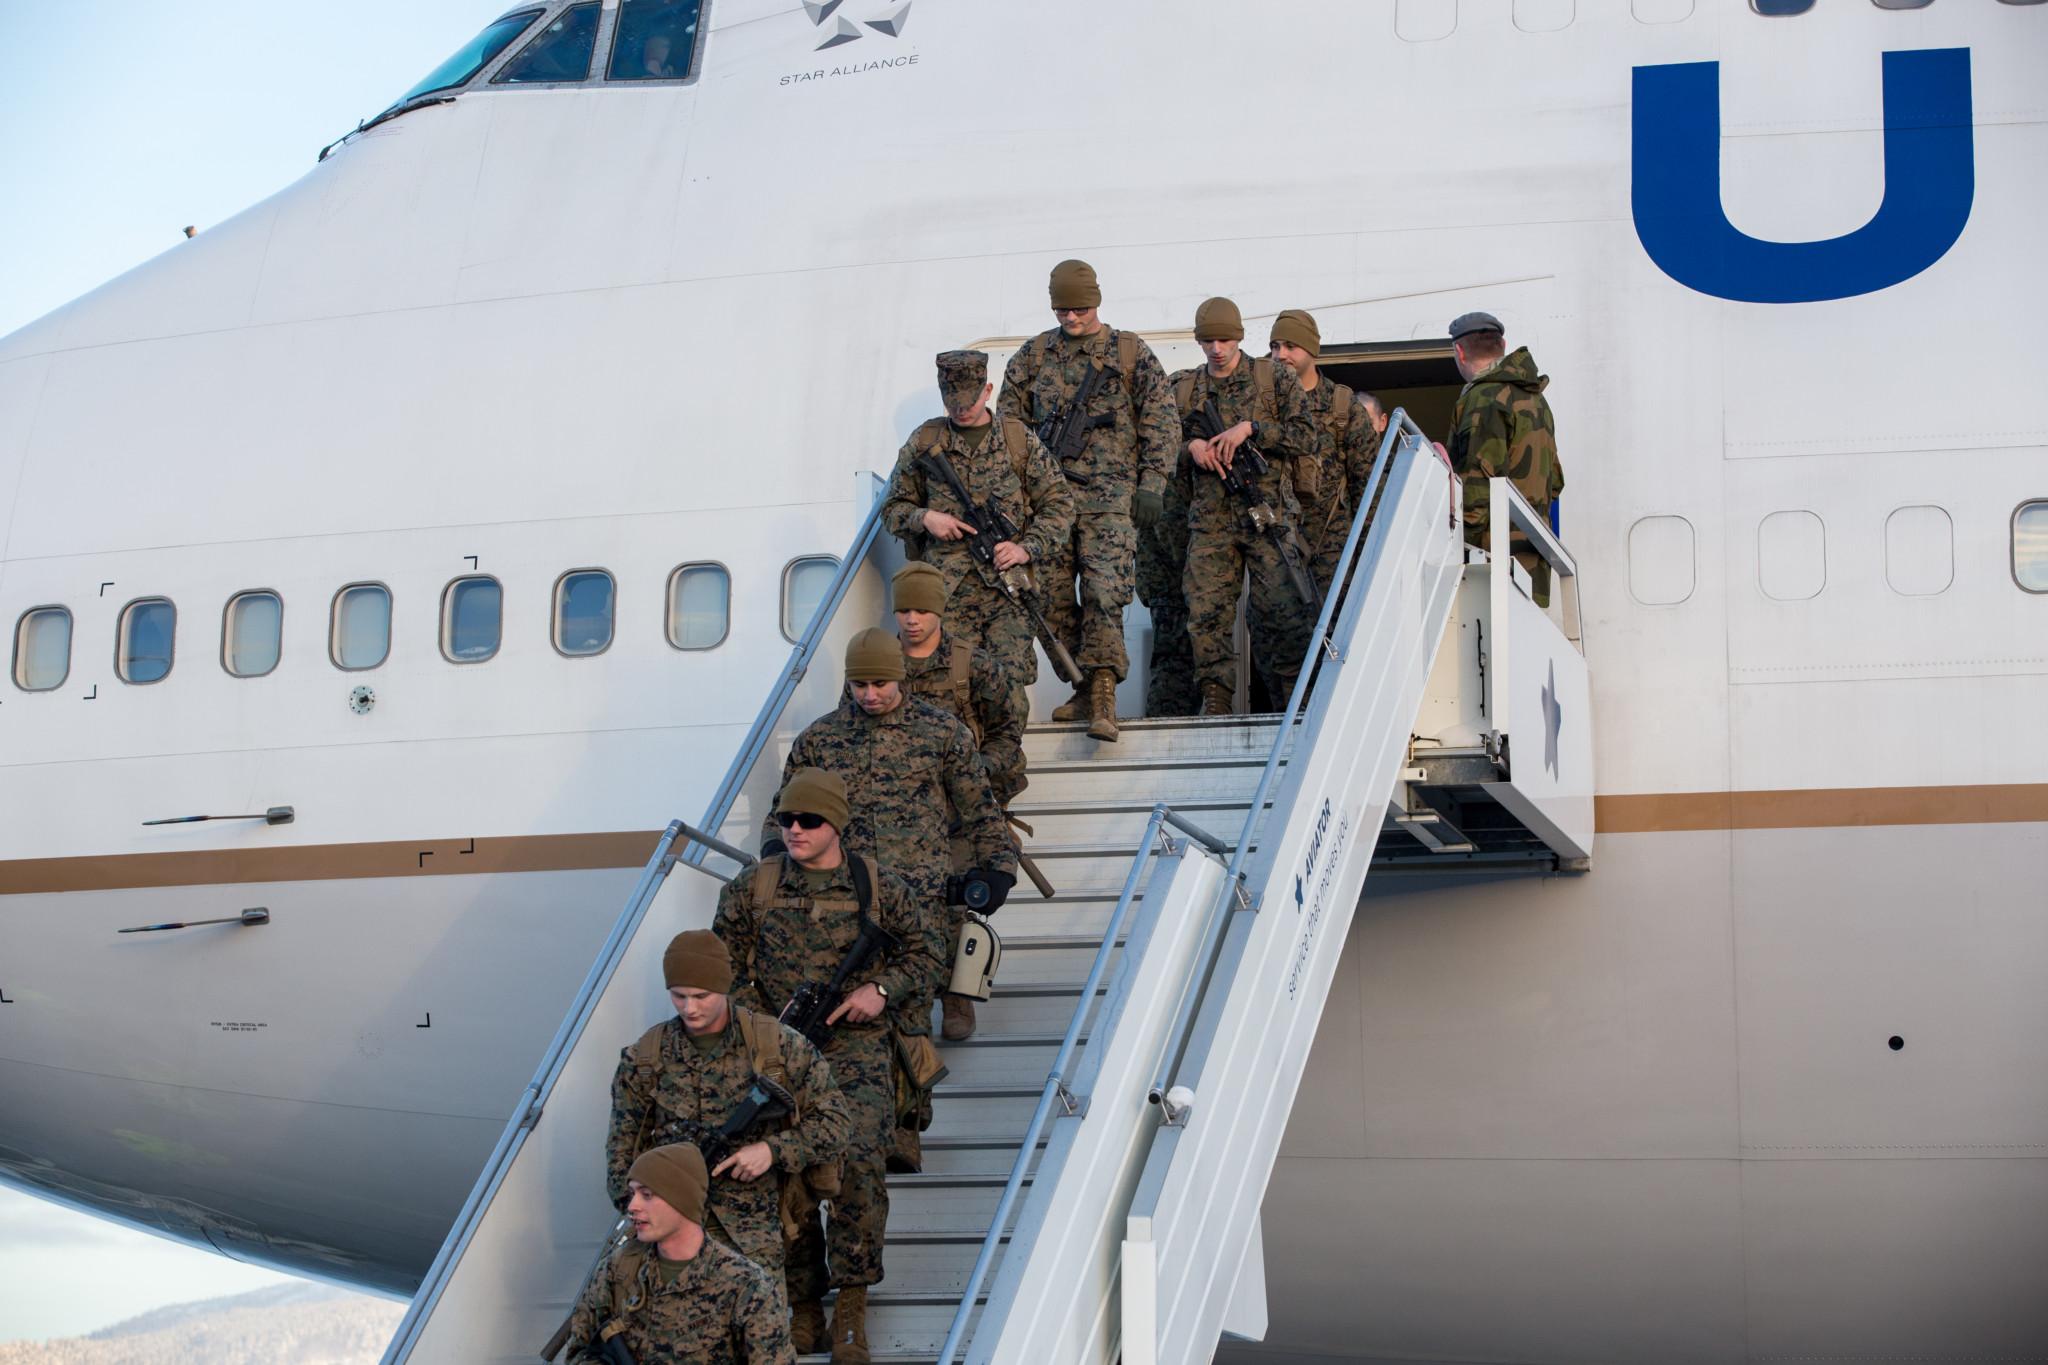 United States Marine Corps ankommer Værnes lufthavn (Trondheim) / United States Marine Corps arriving at Værnes airport (Trondheim, Norway). 16. januar 2017. Foto: TOM-DANIEL S. LAUGERUD/FORSVARET